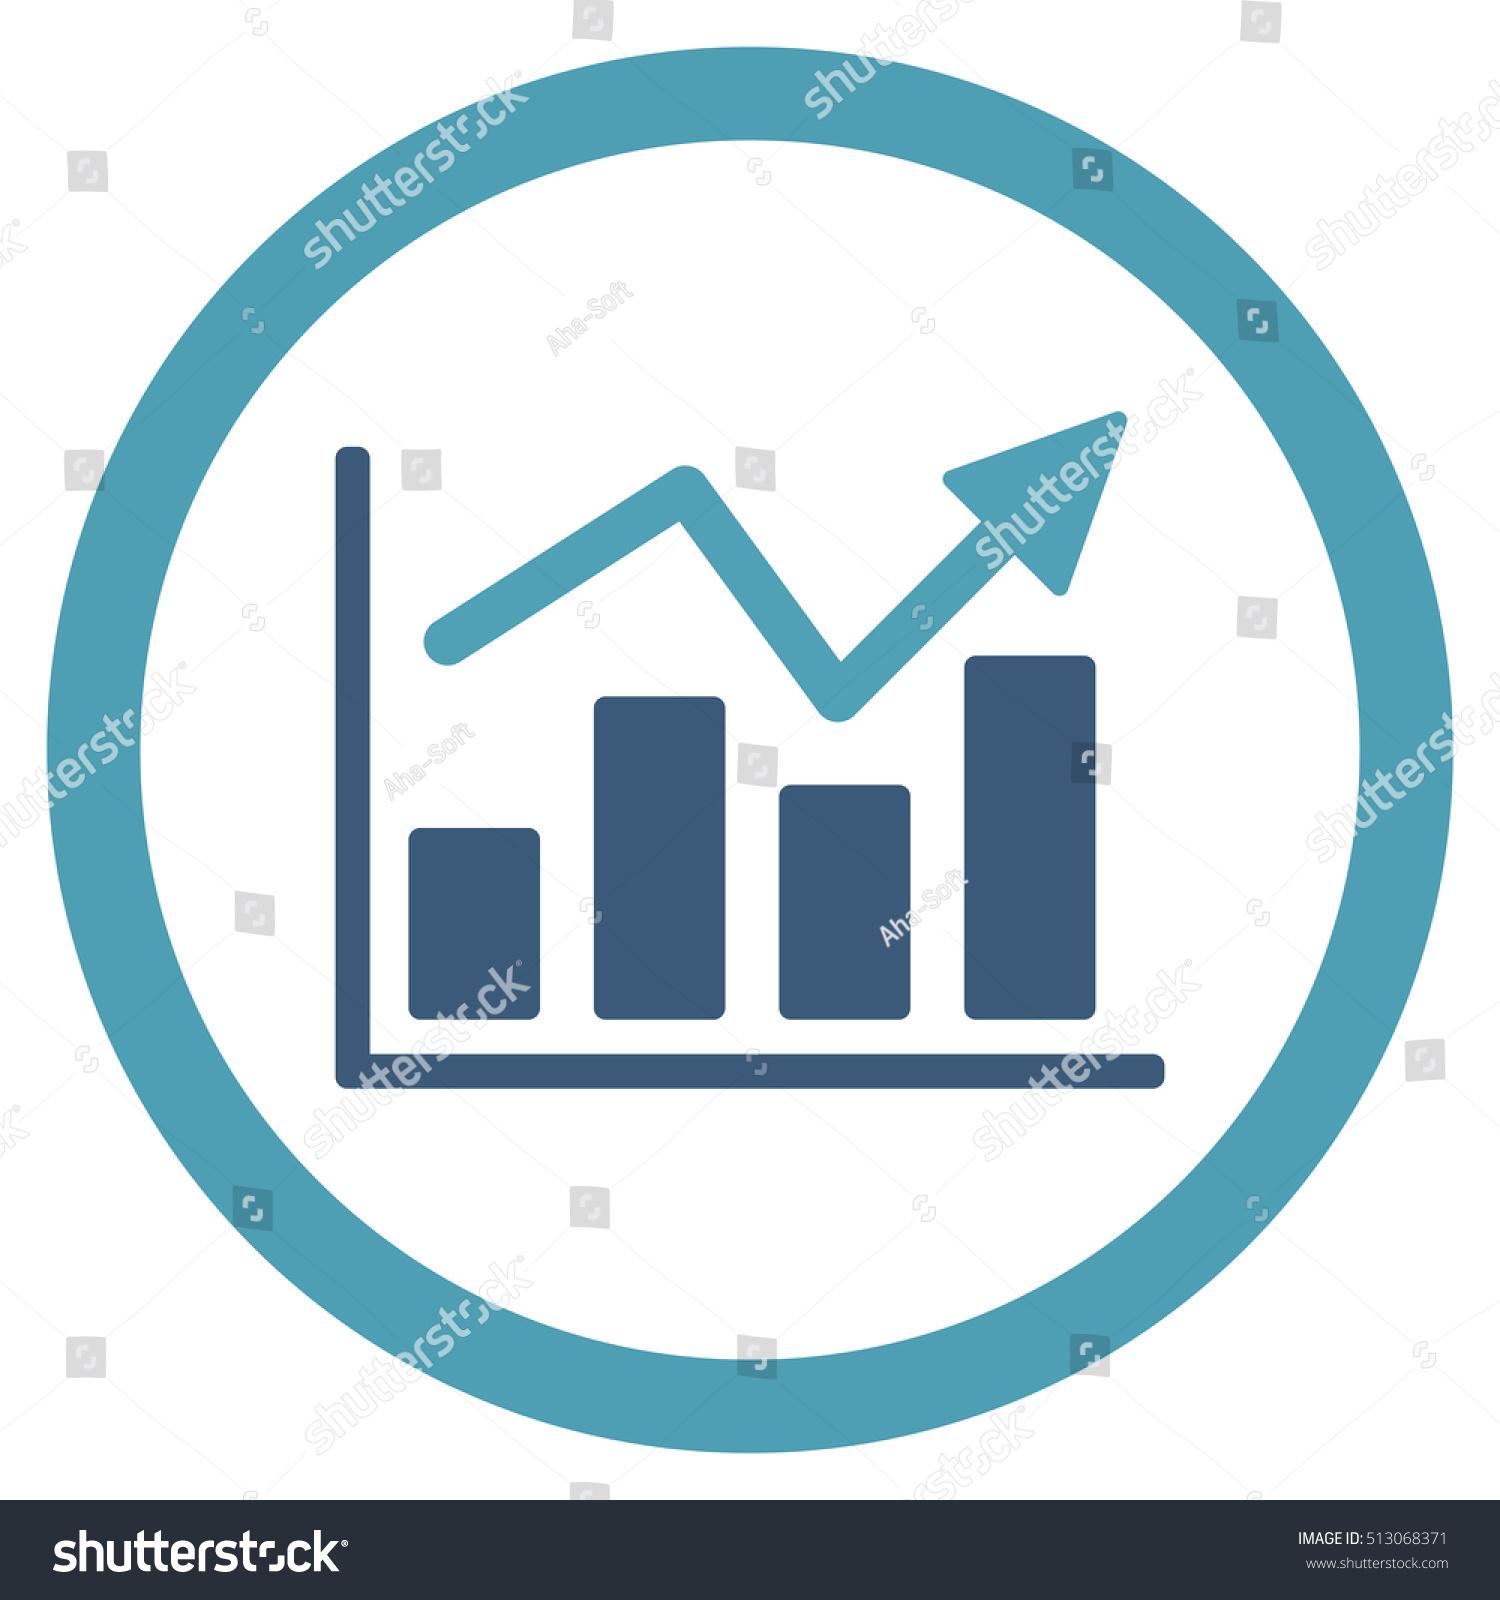 bar chart trend rounded icon glyph stock illustration 513068371 rh shutterstock com